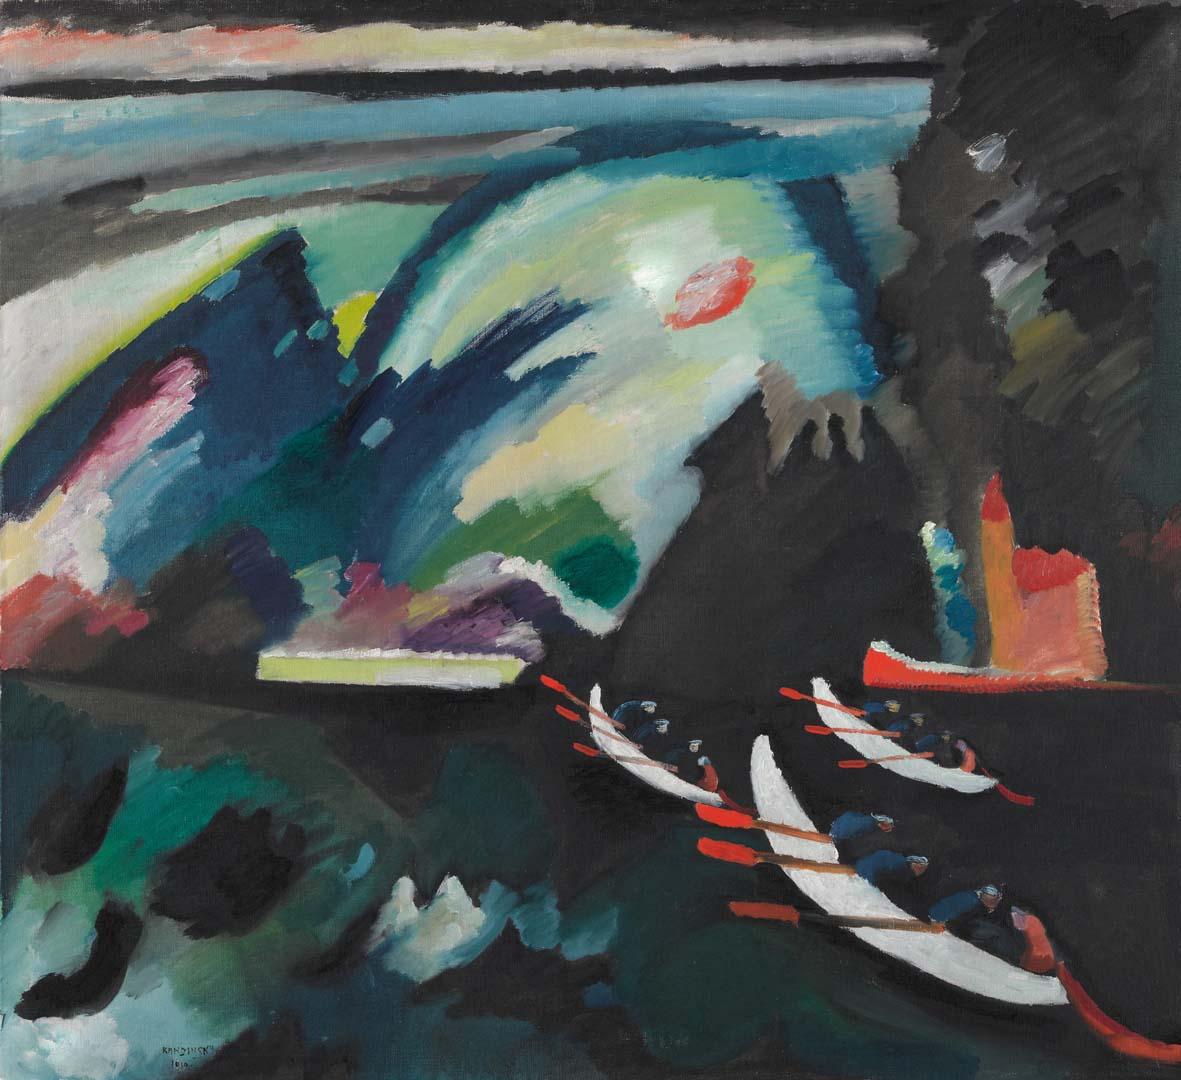 Vasilij Kandinskij: Lago. 1910. Olio su tela. 98 x 105. Mosca, Galleria Tret'jakovskaja